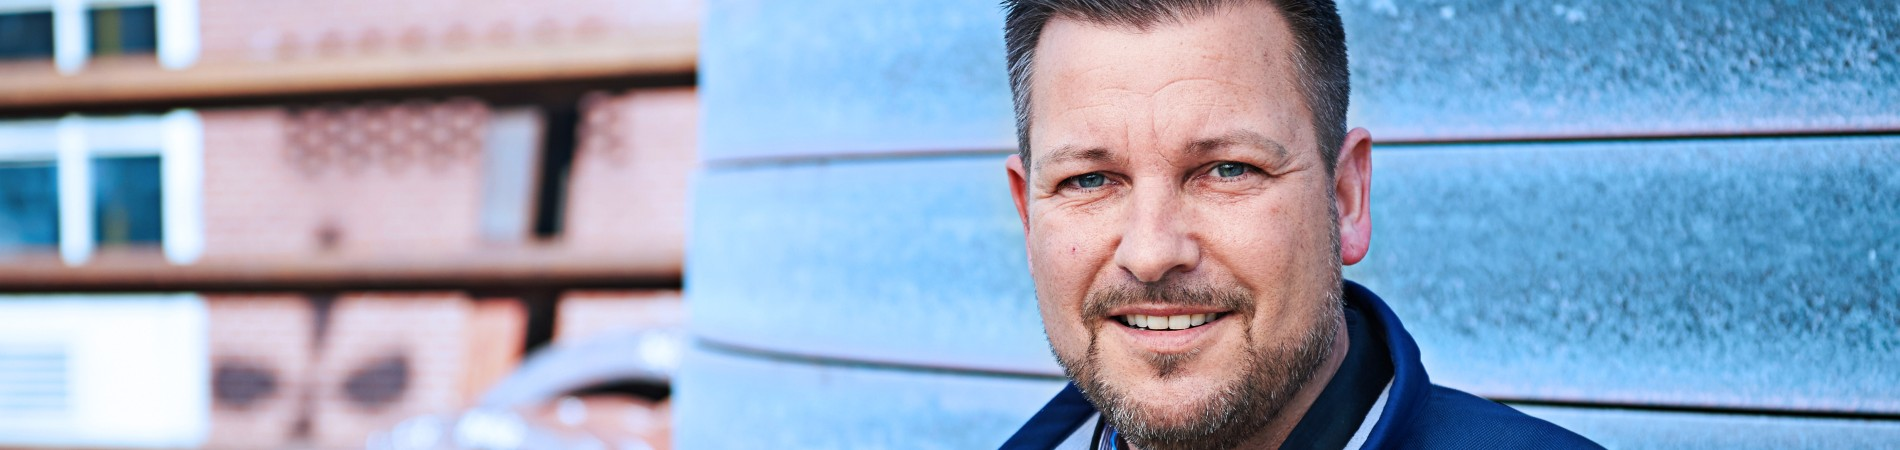 thyssenkrupp Bearings Mitarbeiter-Erfahrungsbericht Markus Bömeke